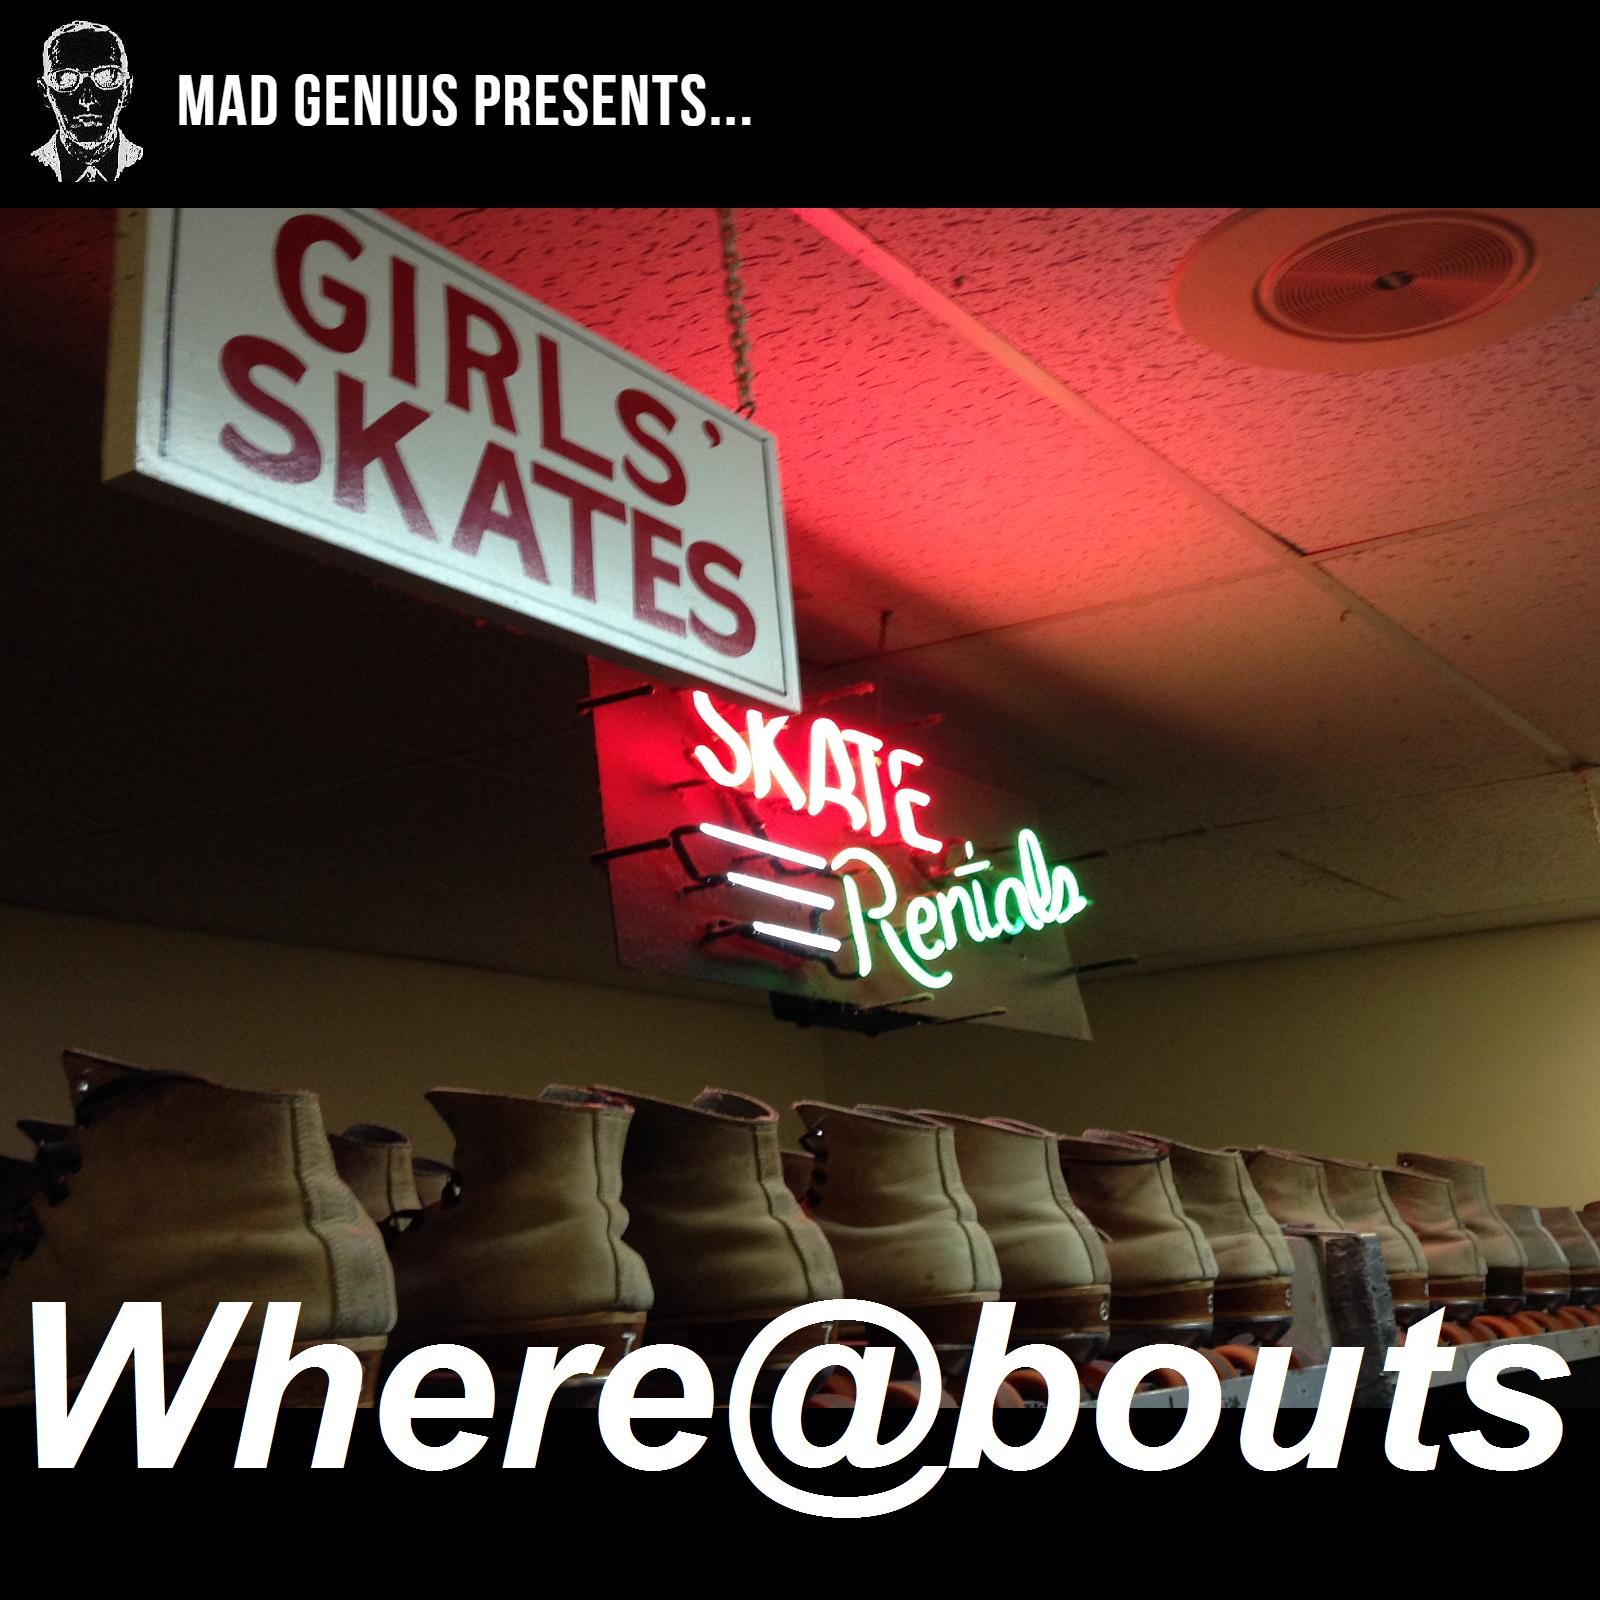 Where_bouts_-_the_magic_skates_cover_small